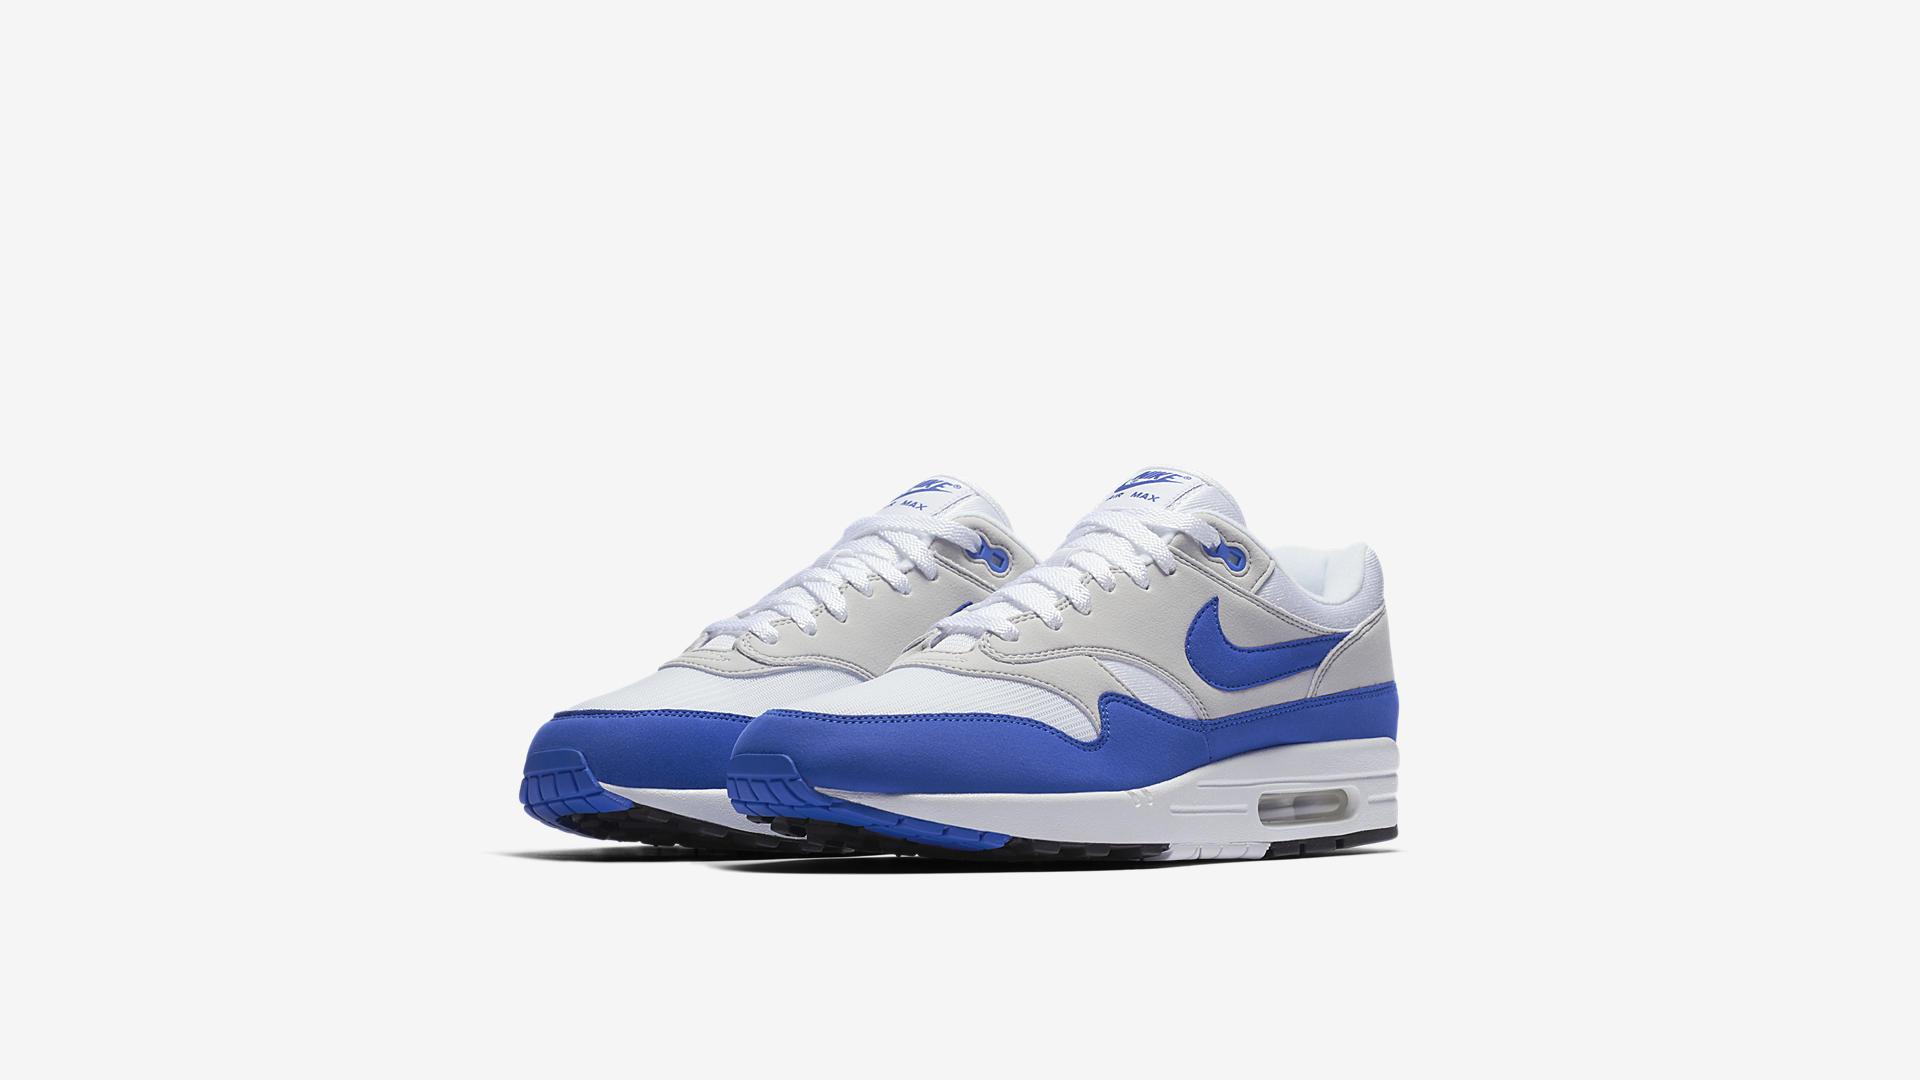 908375 102 Nike Air Max 1 Anniversary Game Royal 5